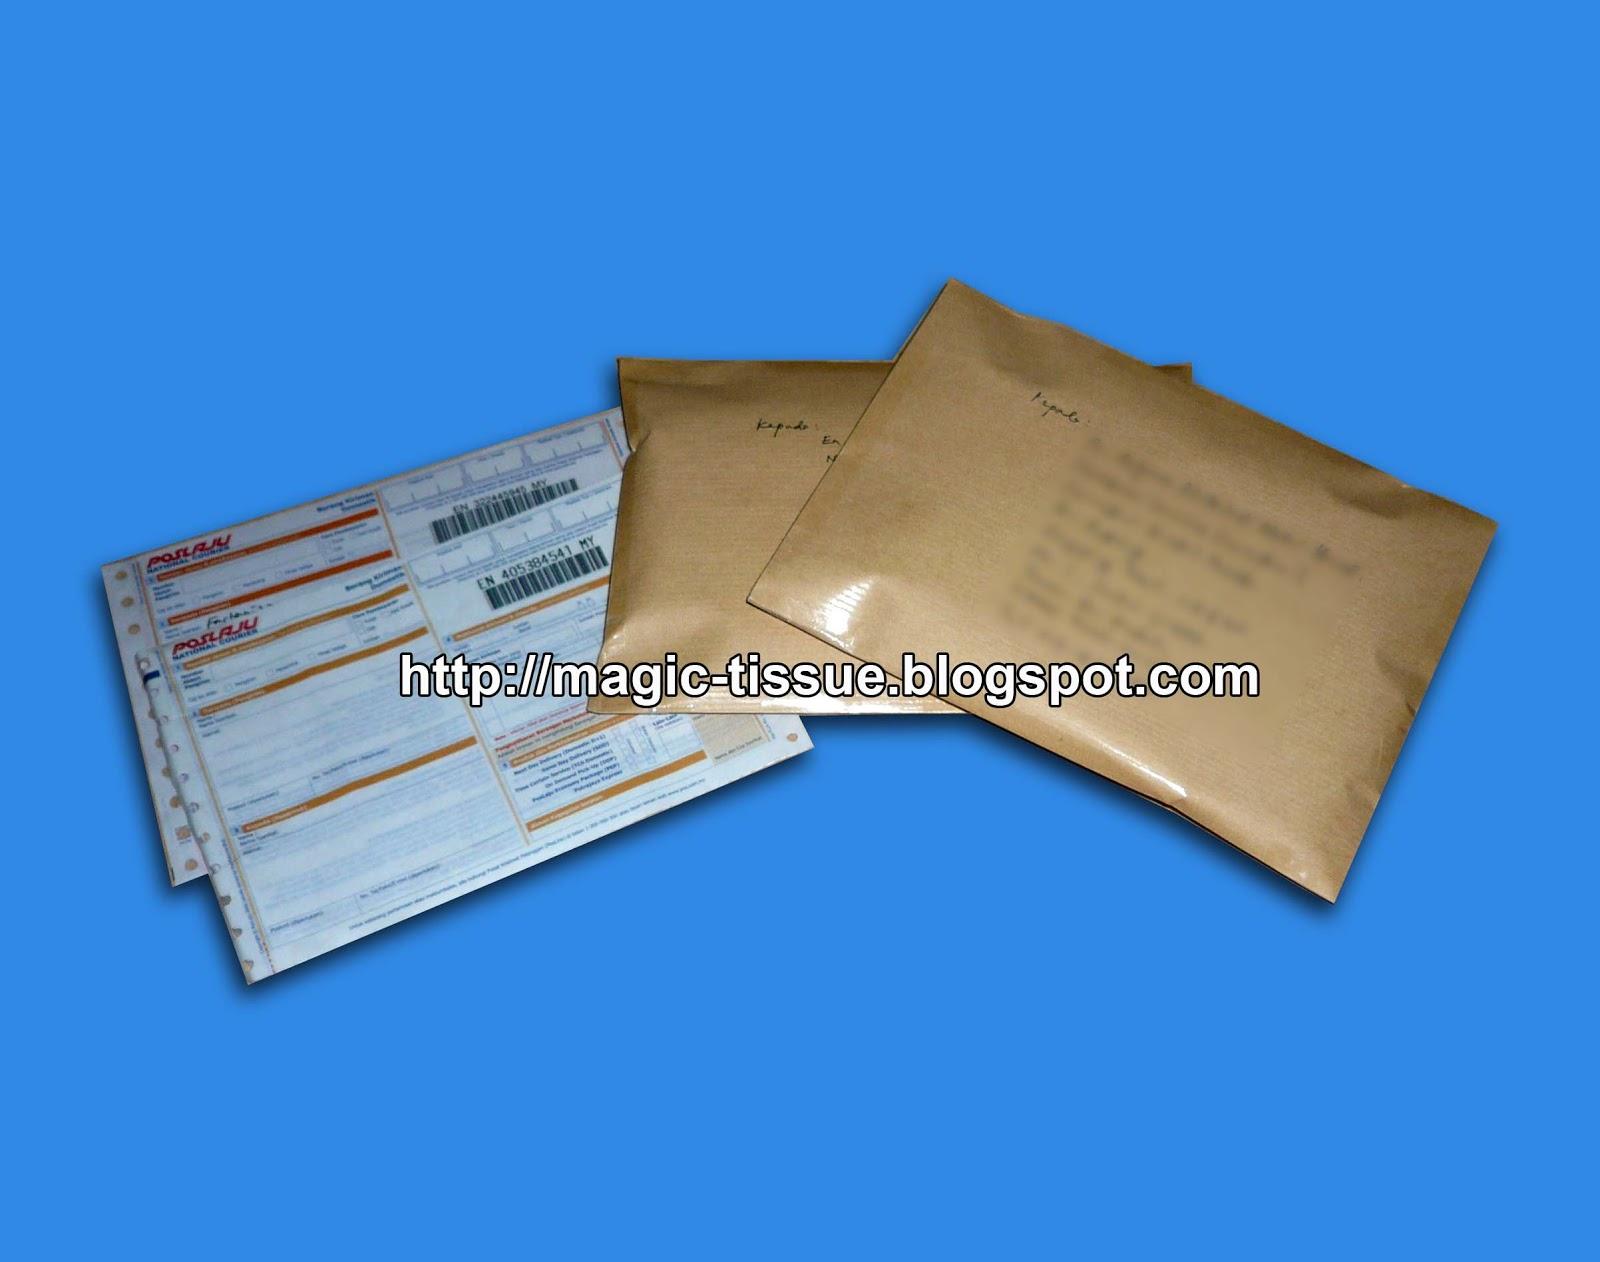 Harga Jual Tissue Tisu Super Magic Man 8500 Power Depkes For Malaysian Buyers